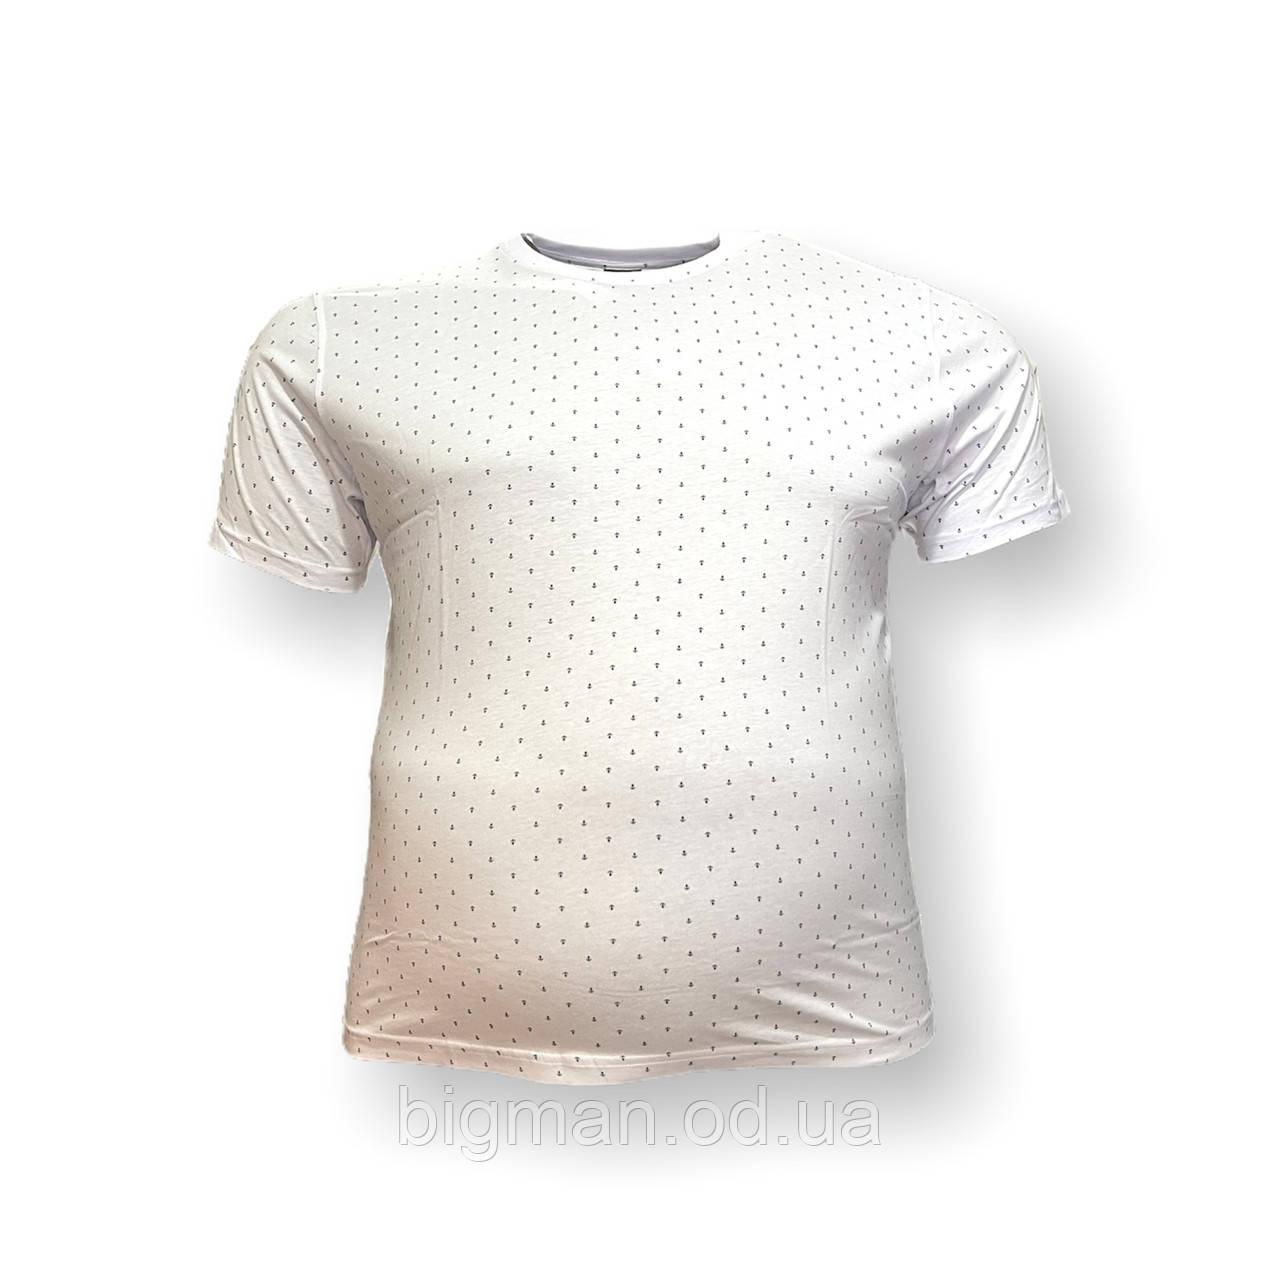 Мужская батальная футболка Borcan 12109 3XL 4XL 5XL 6XL белая большие размеры Турция